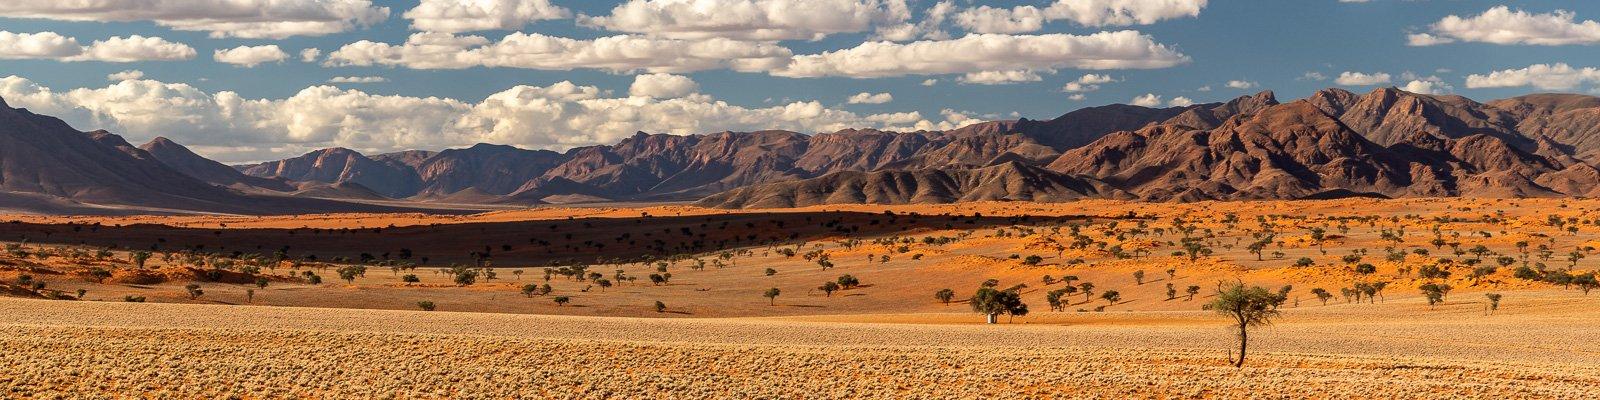 Namibia-Landschaften-header